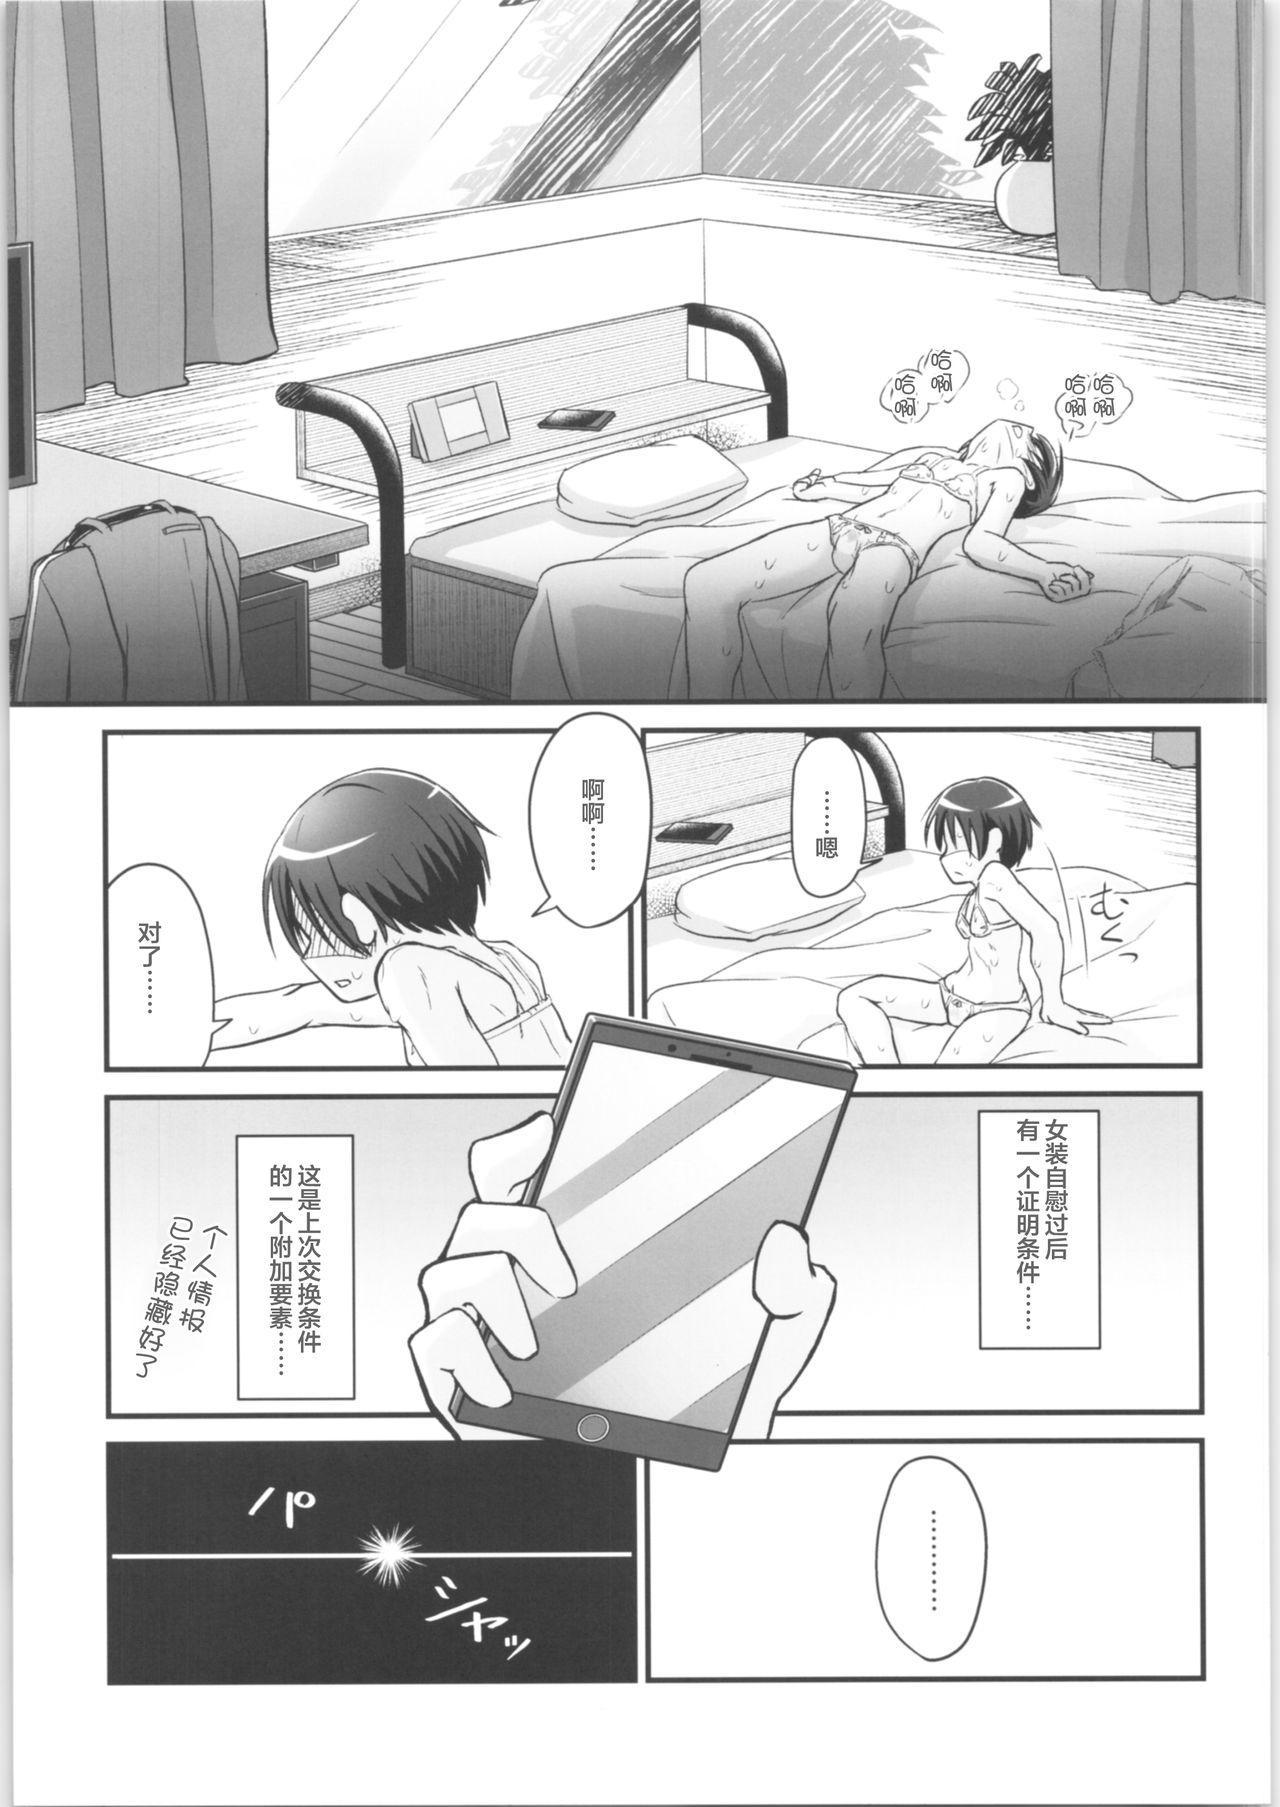 [Umari-ya (D-2)] Kiriko Route Another #02 ~Shitagi Josou Jii Kyouyou Hen~ (Sword Art Online)[Chinese]【不可视汉化】 16